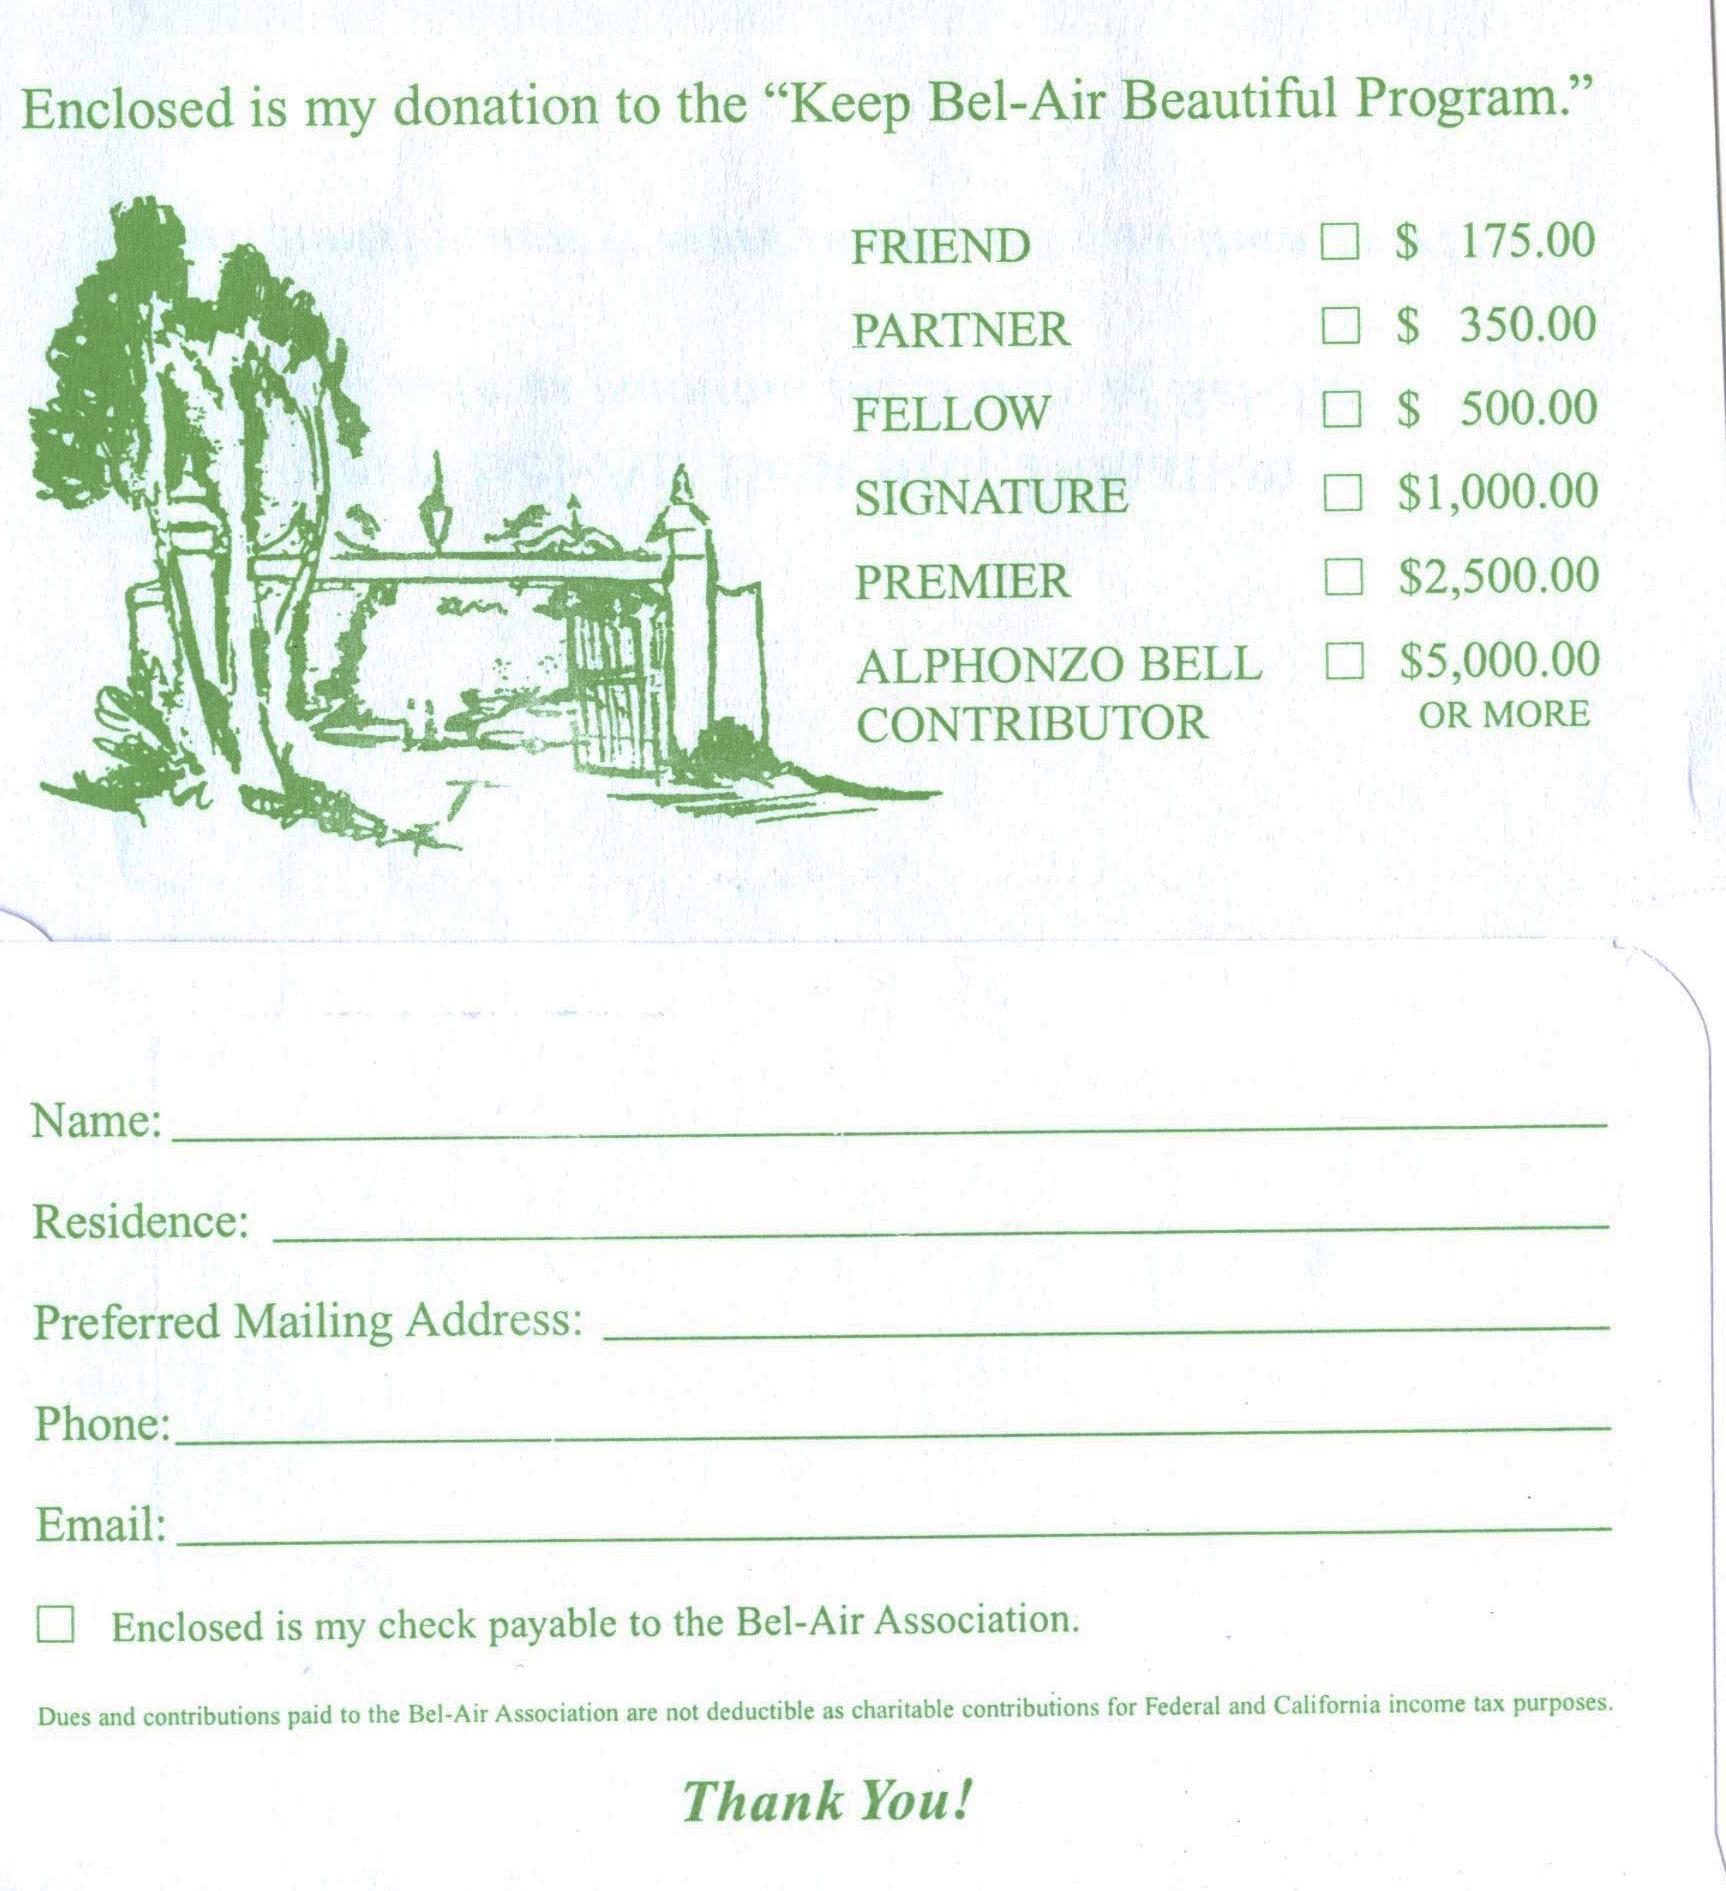 KBAB return envelope.jpg